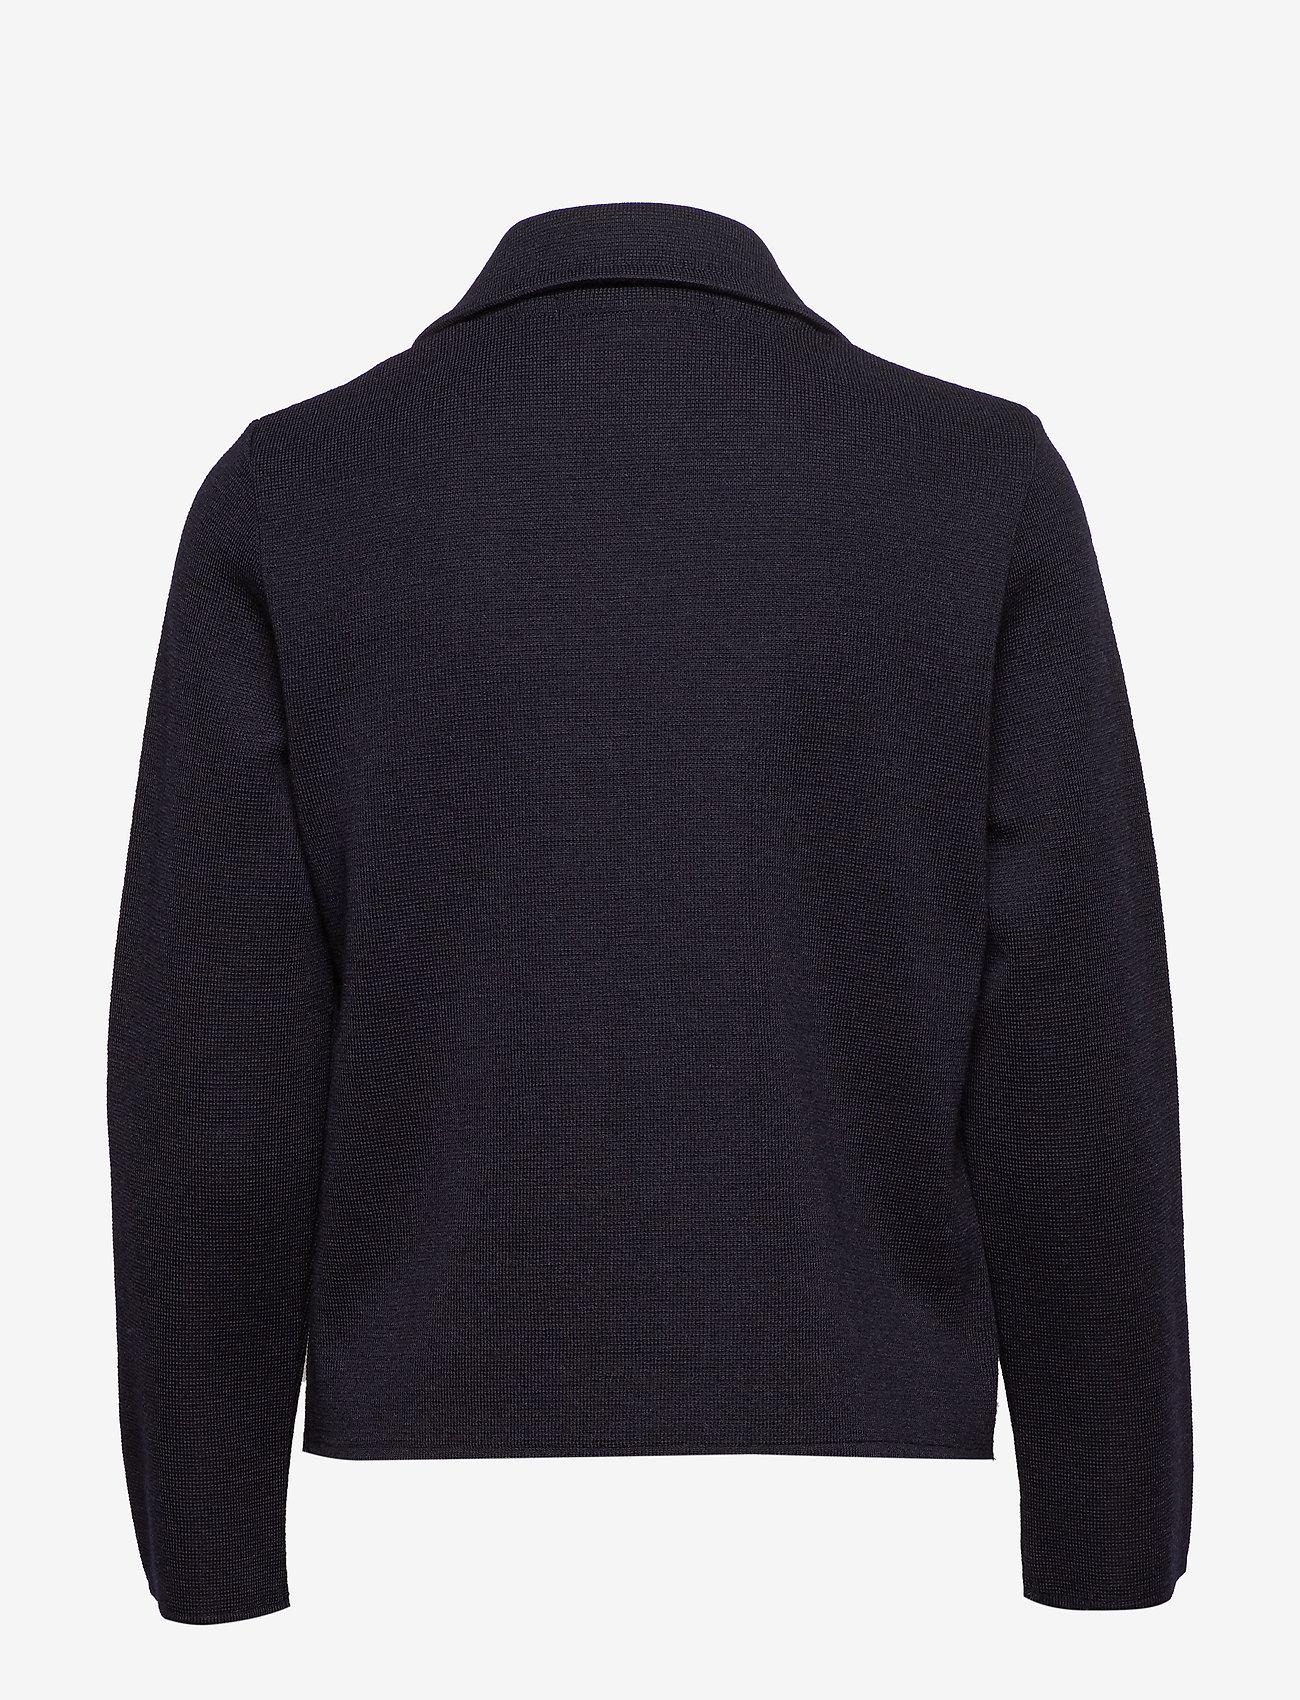 BUSNEL - Indra jacket - wool jackets - marine - 1